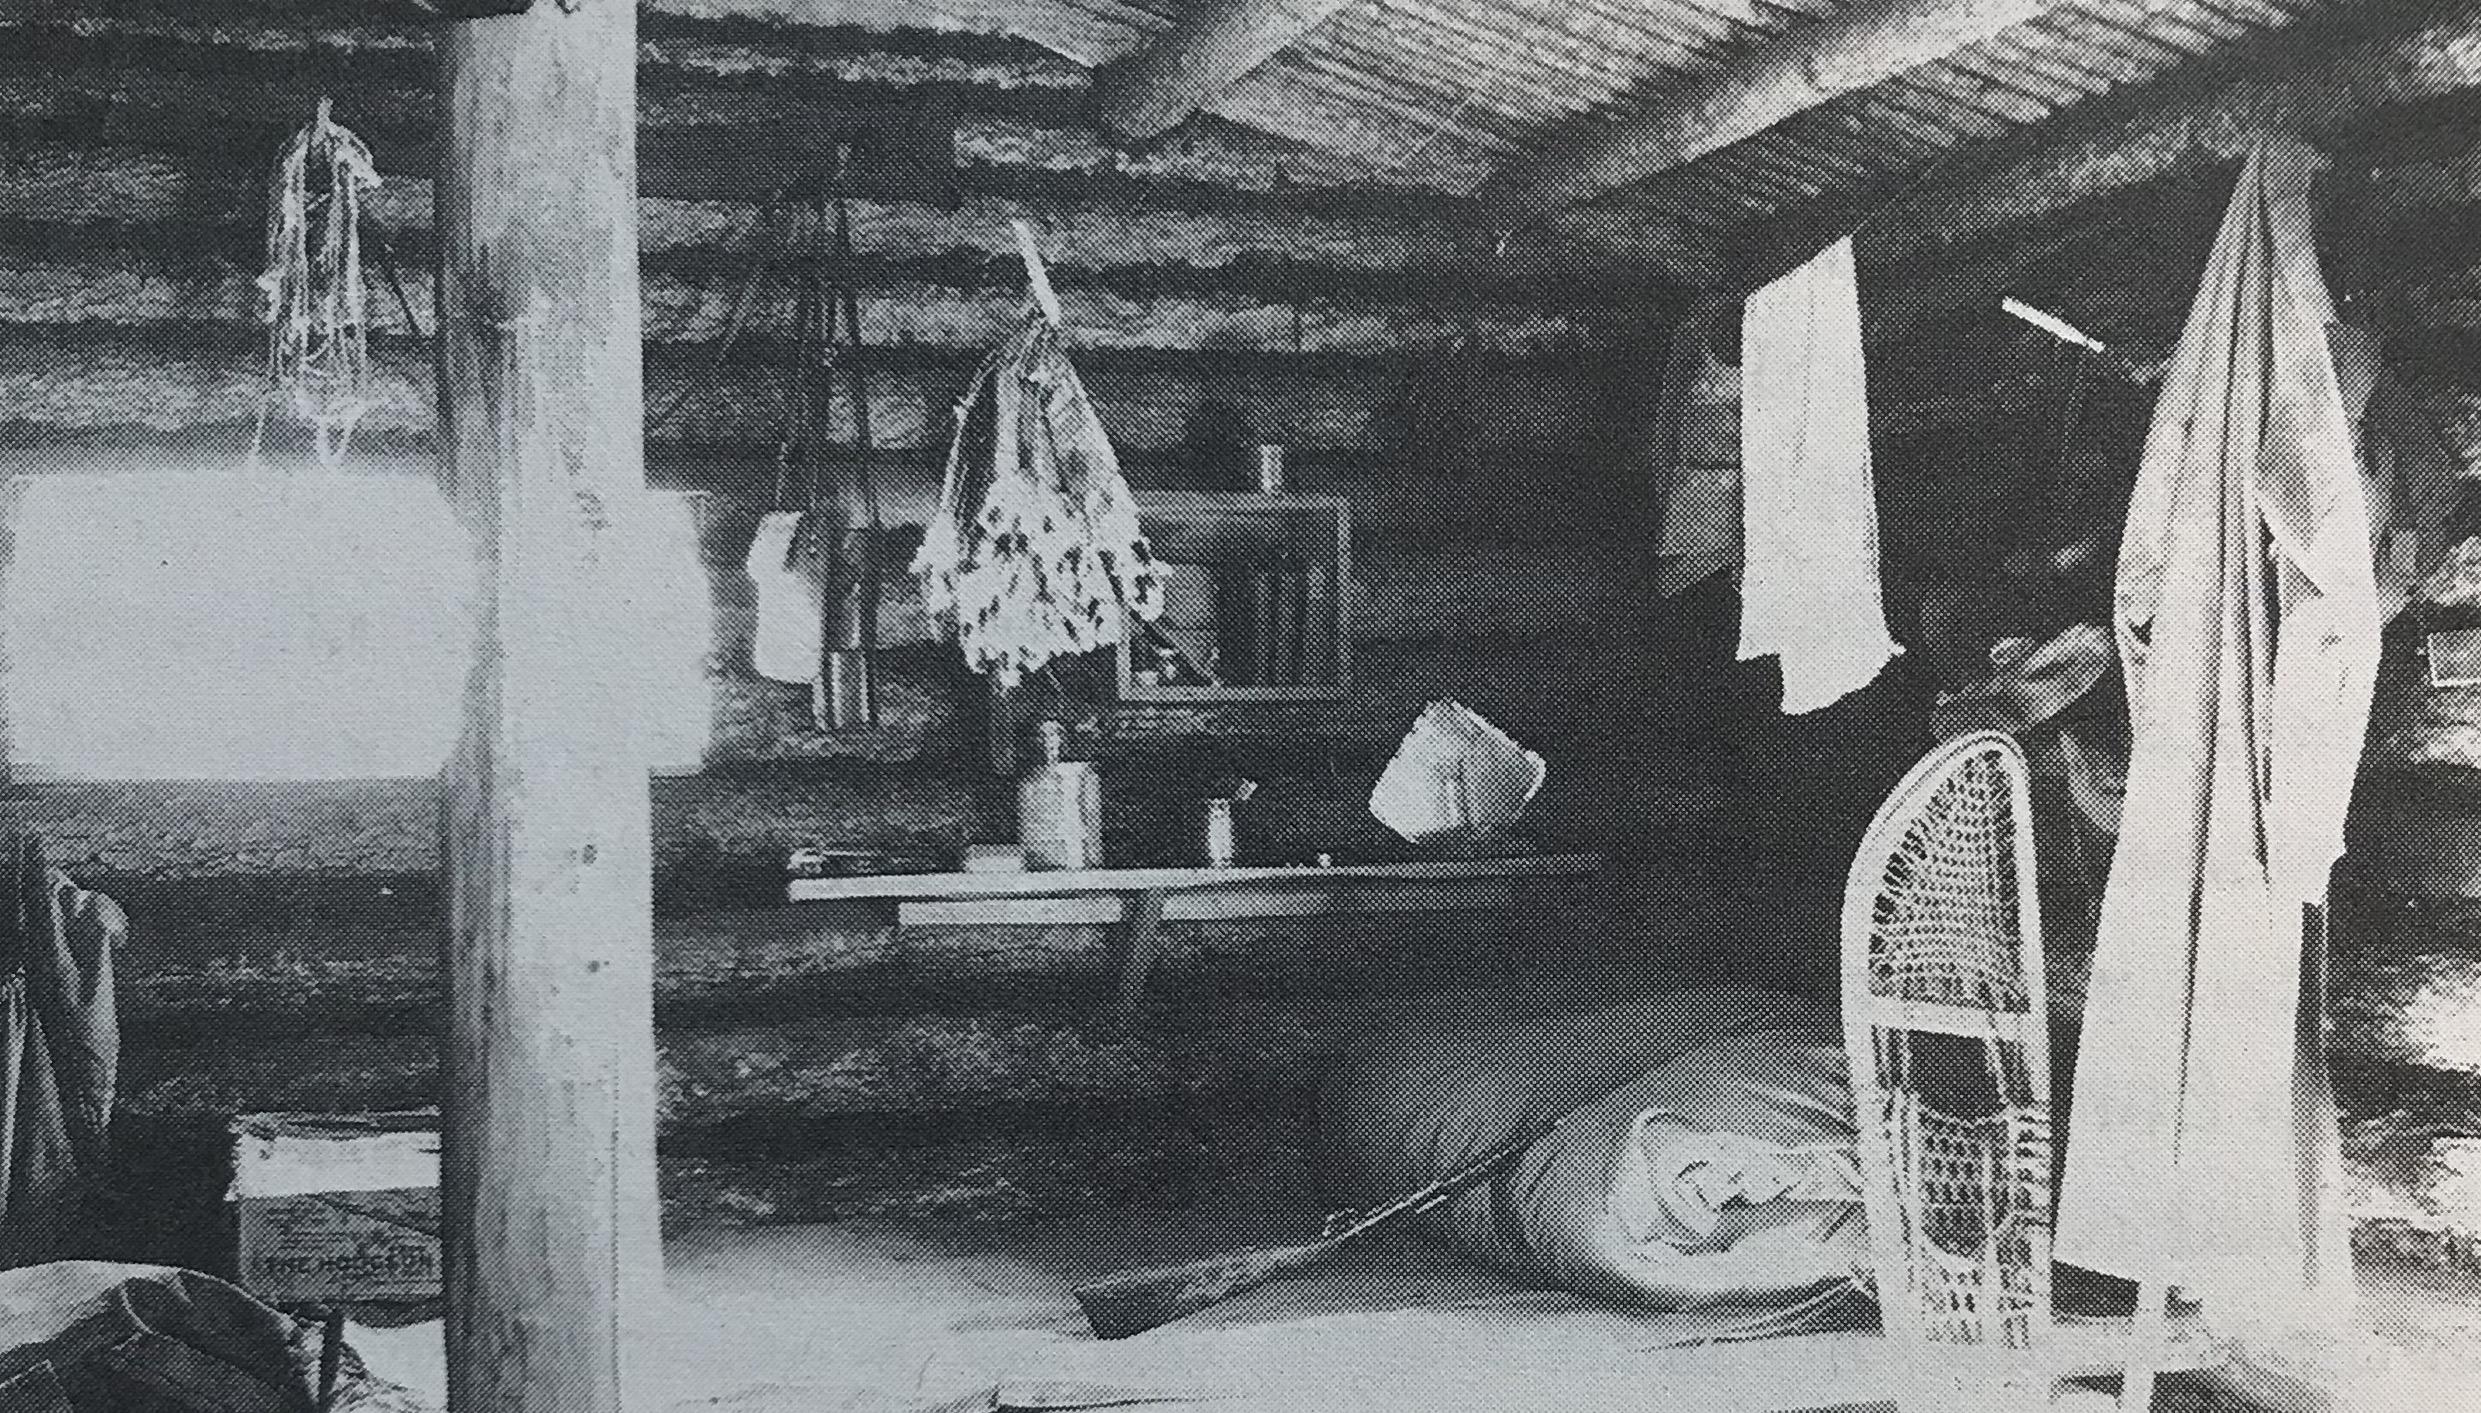 Patterson's cabin.